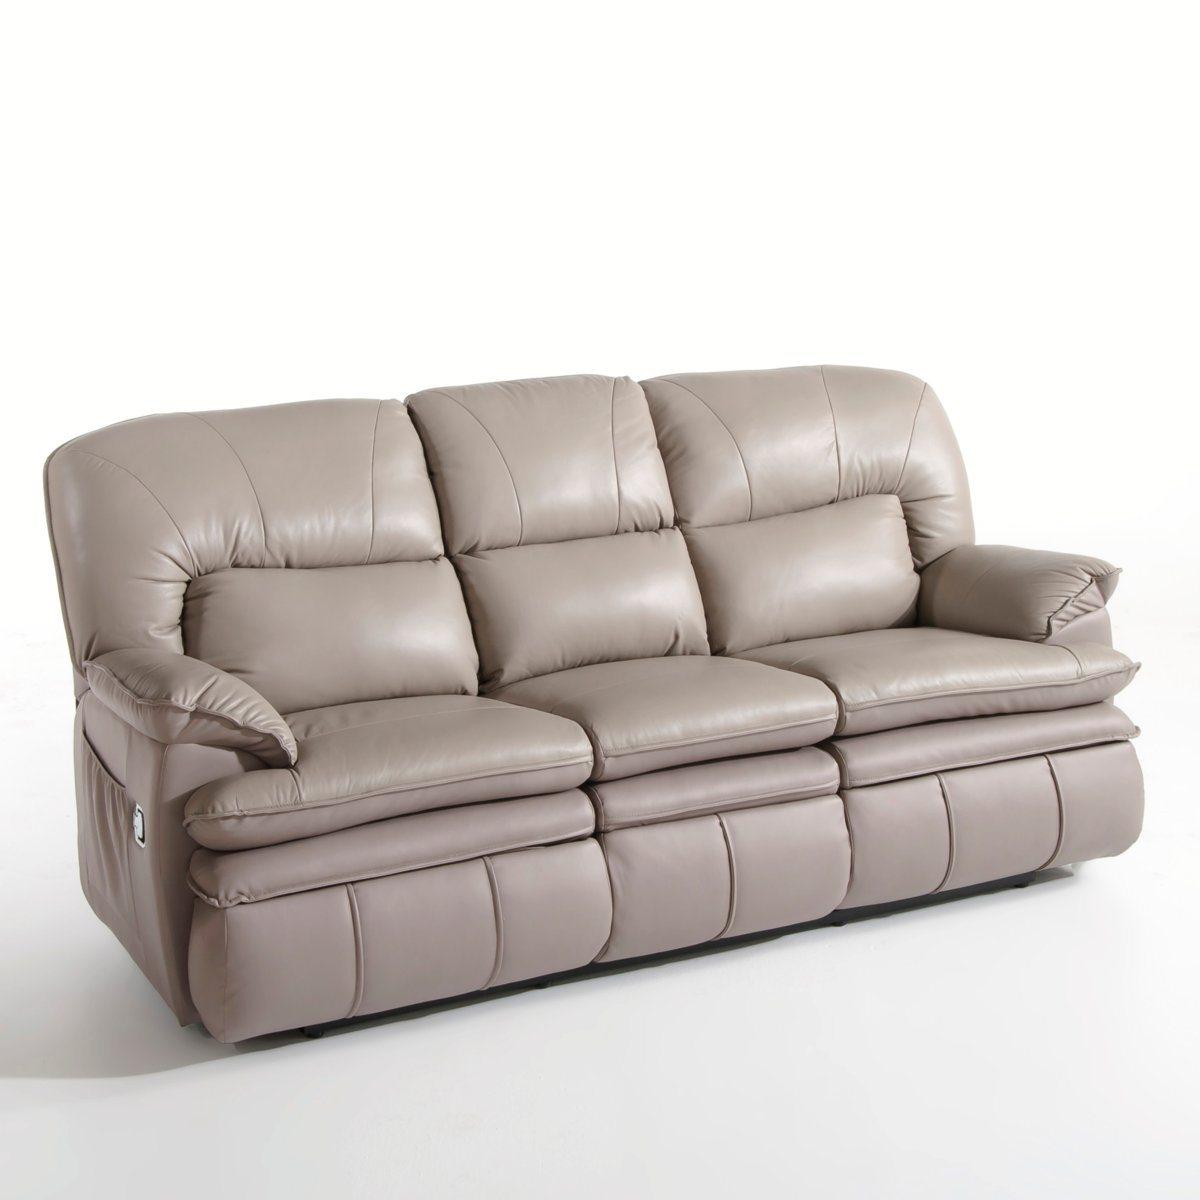 Canapé relaxation, cuir, 2 versions, matei Interieurs | La